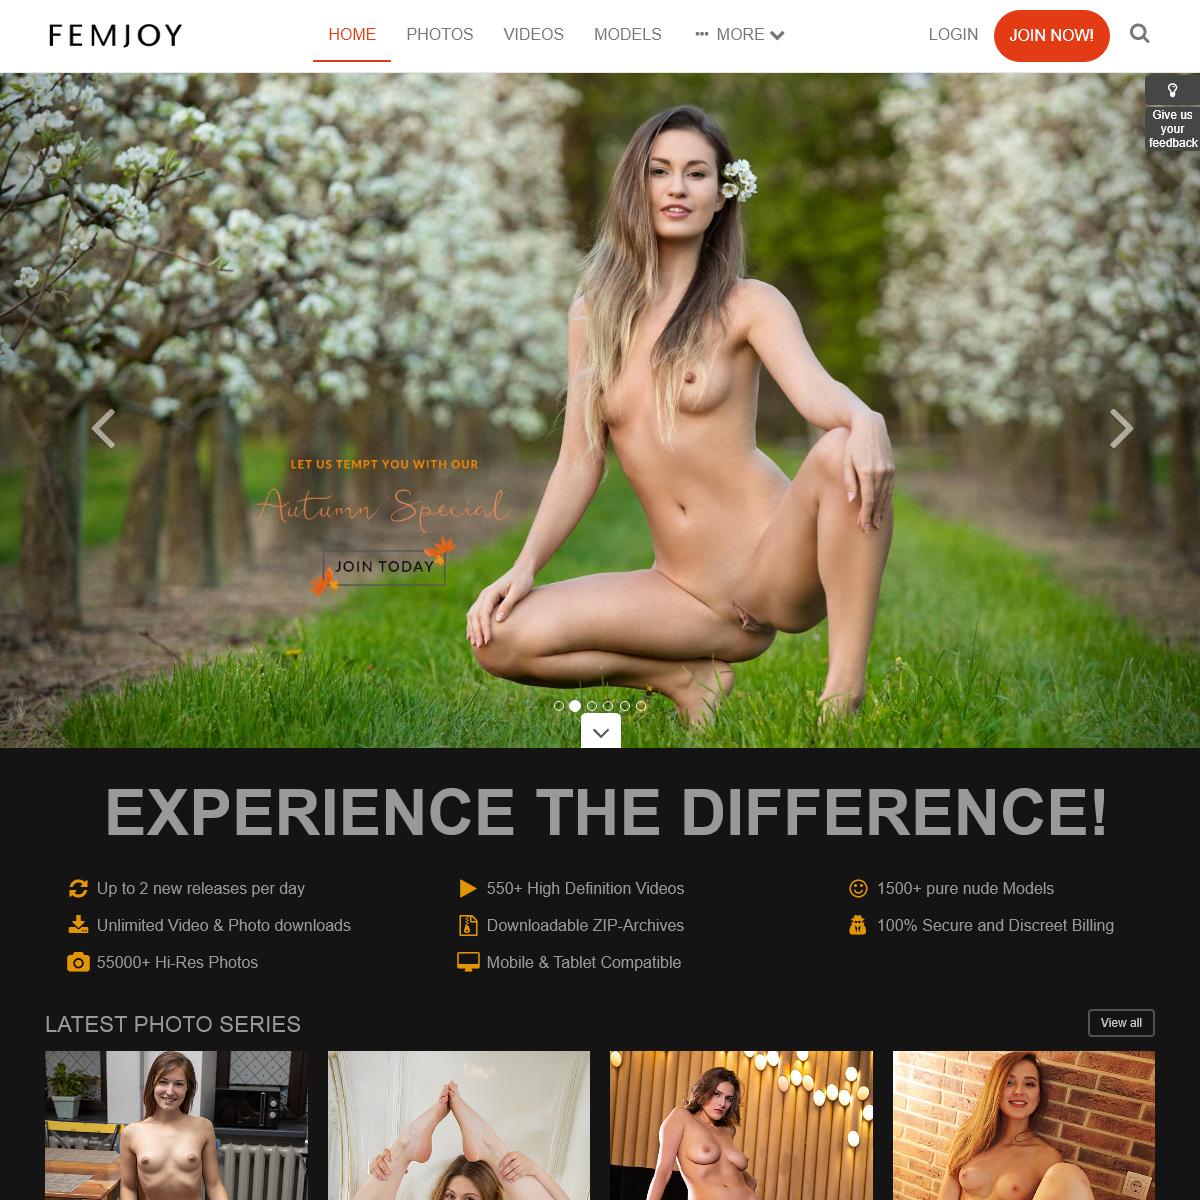 A complete backup of femjoy.com